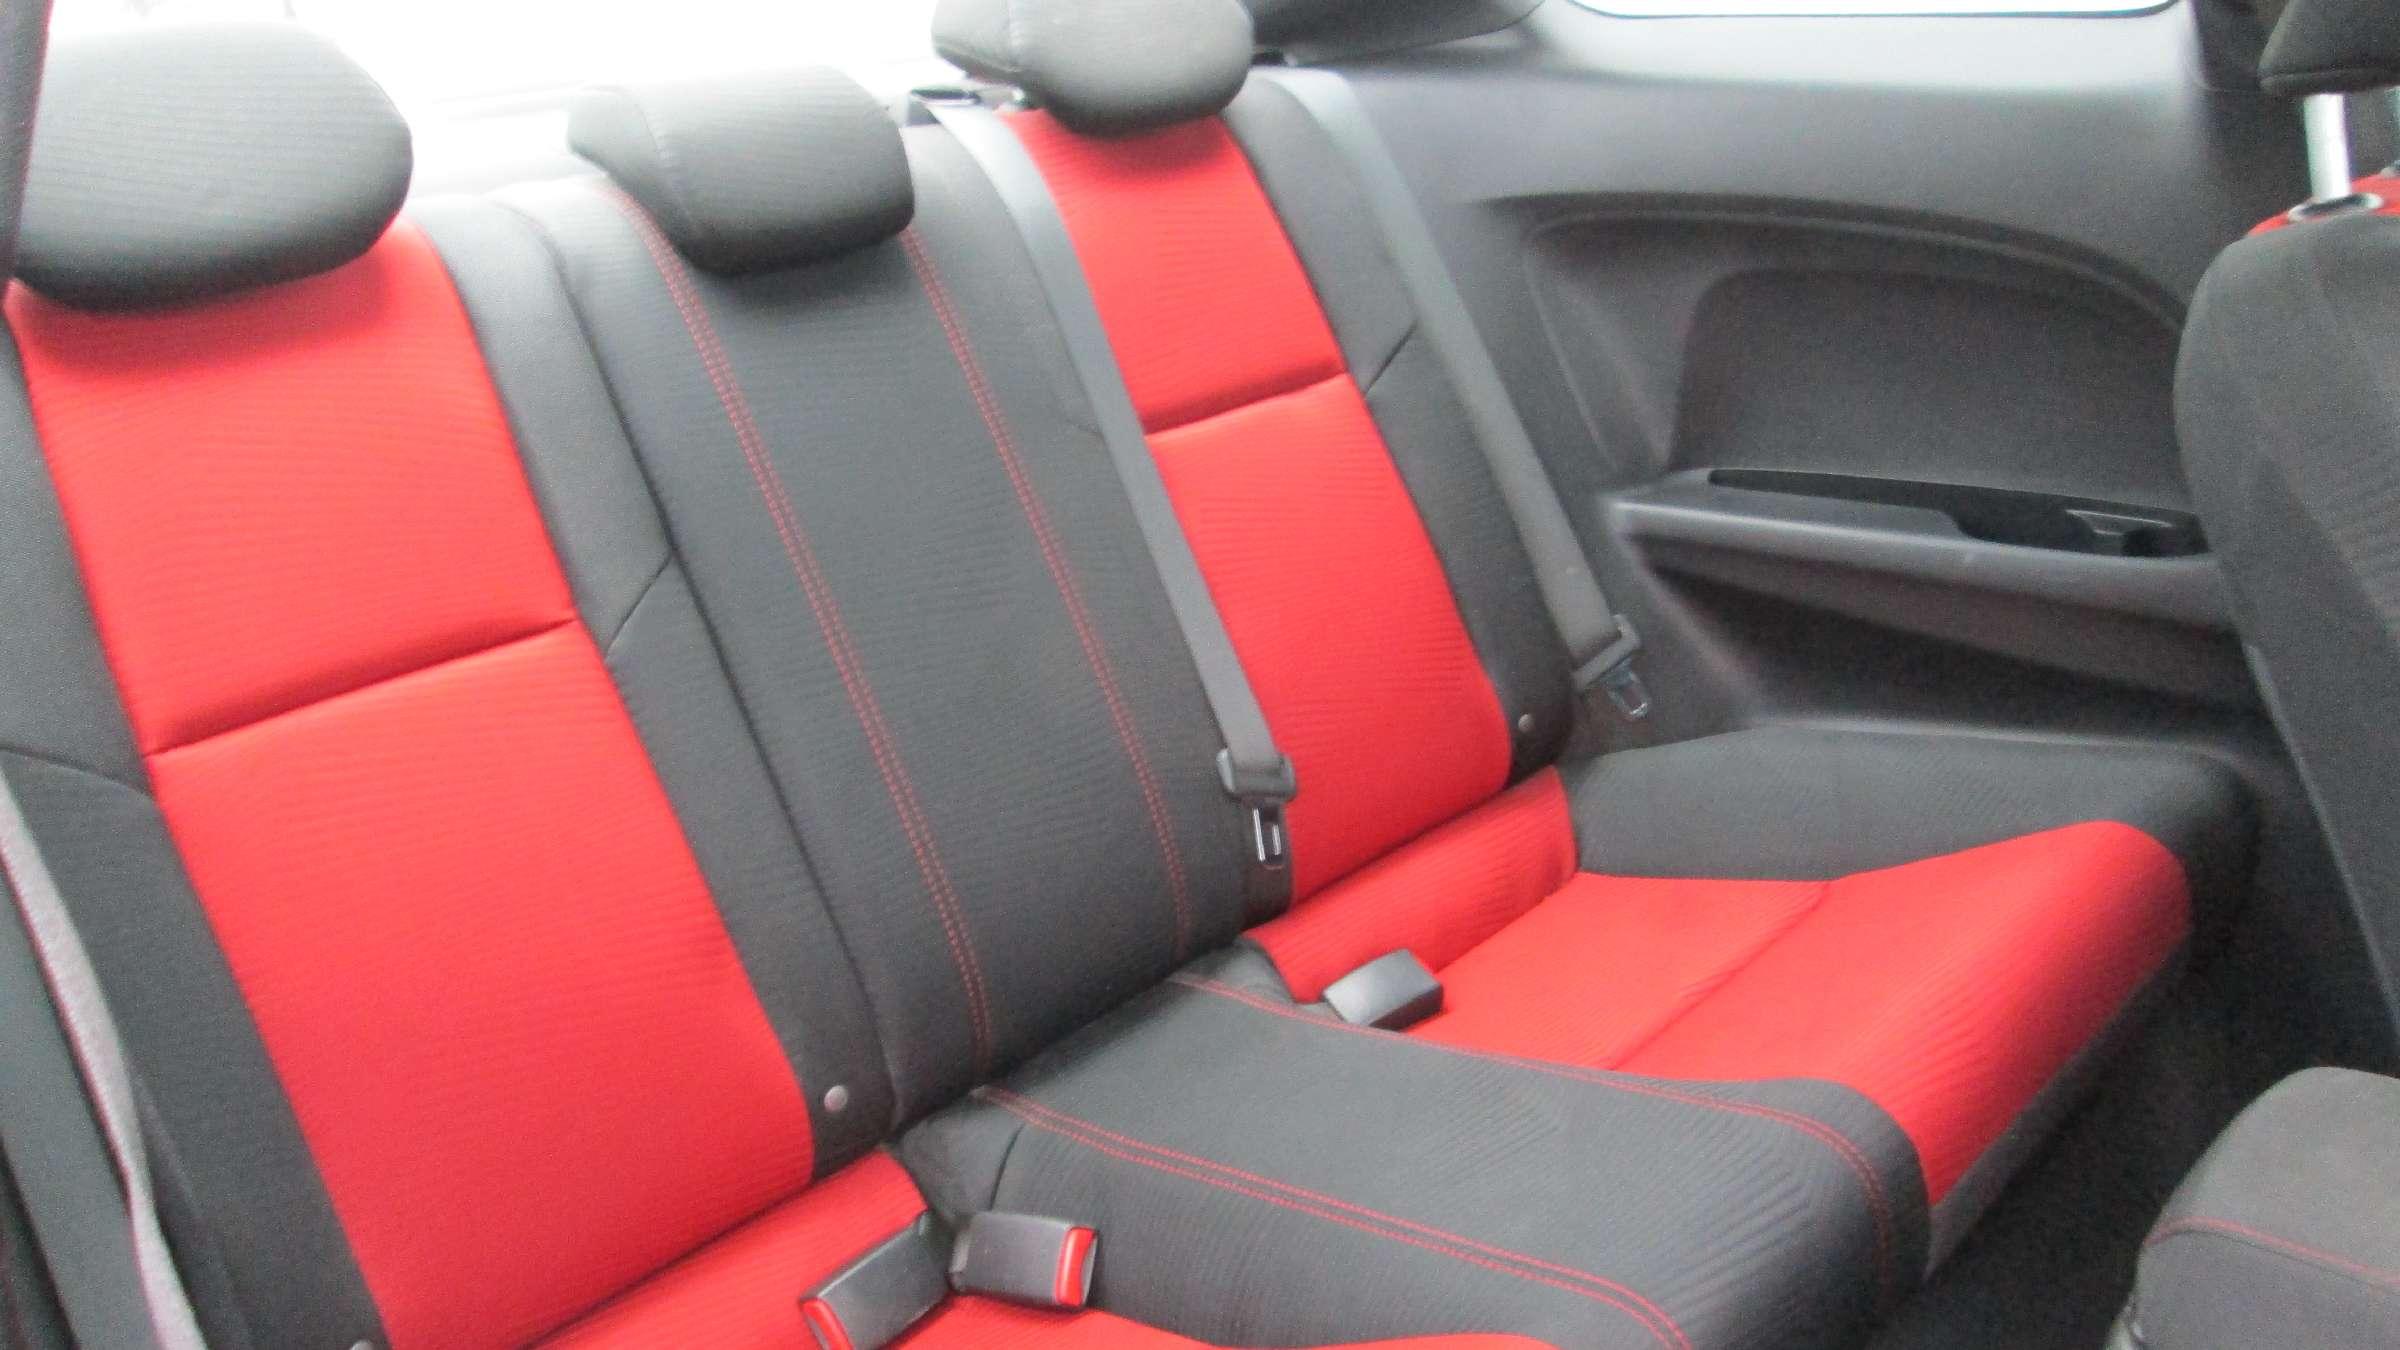 2015 Honda Civic Si (Stk: 171576) in North Bay - Image 11 of 14